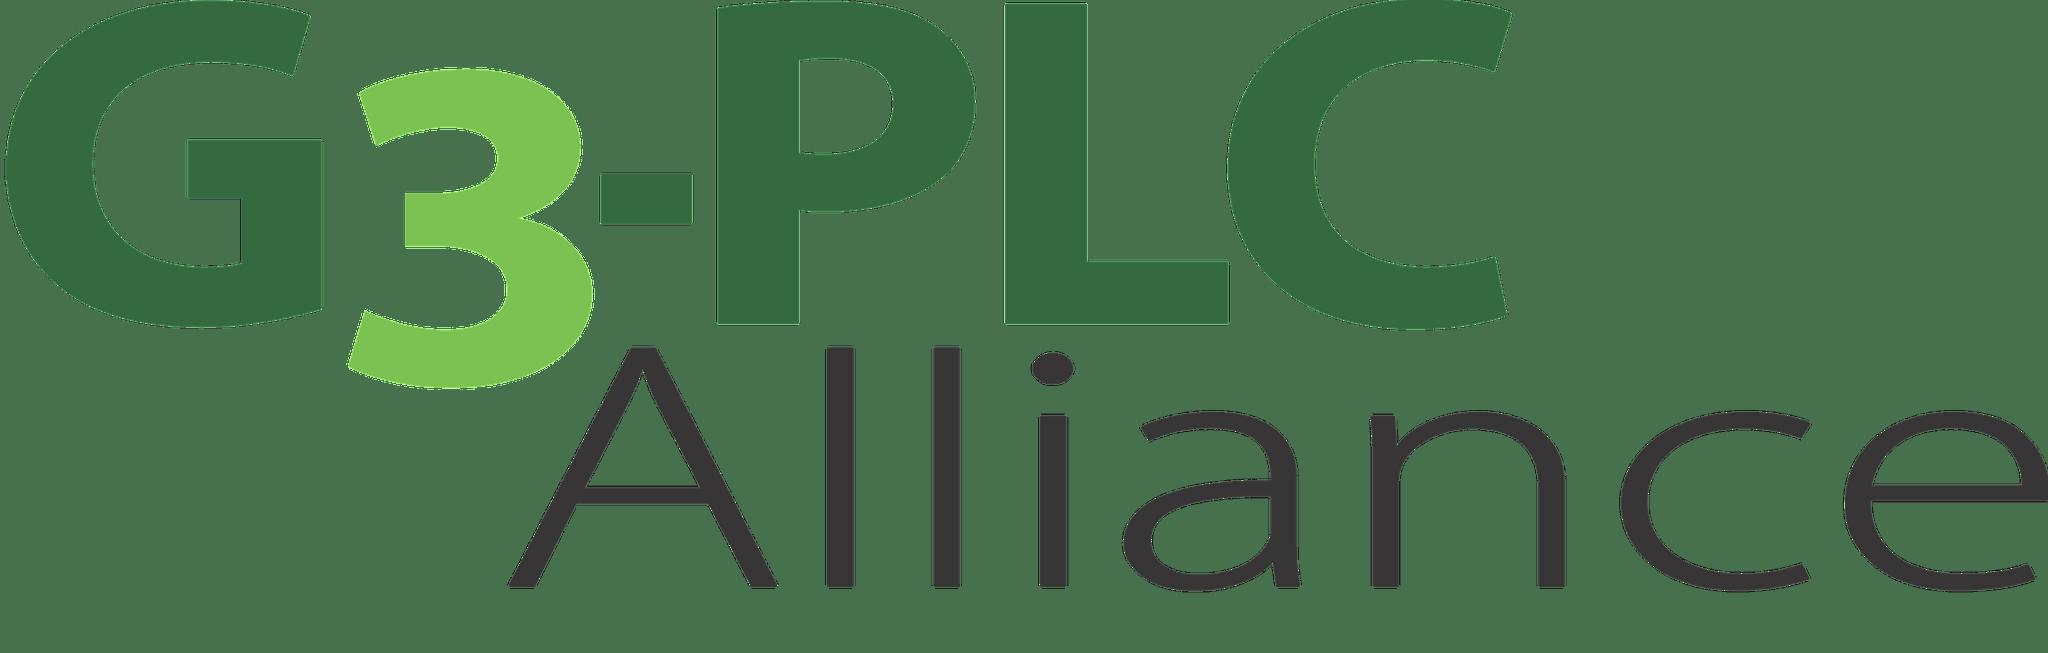 G3-PLC Alliance